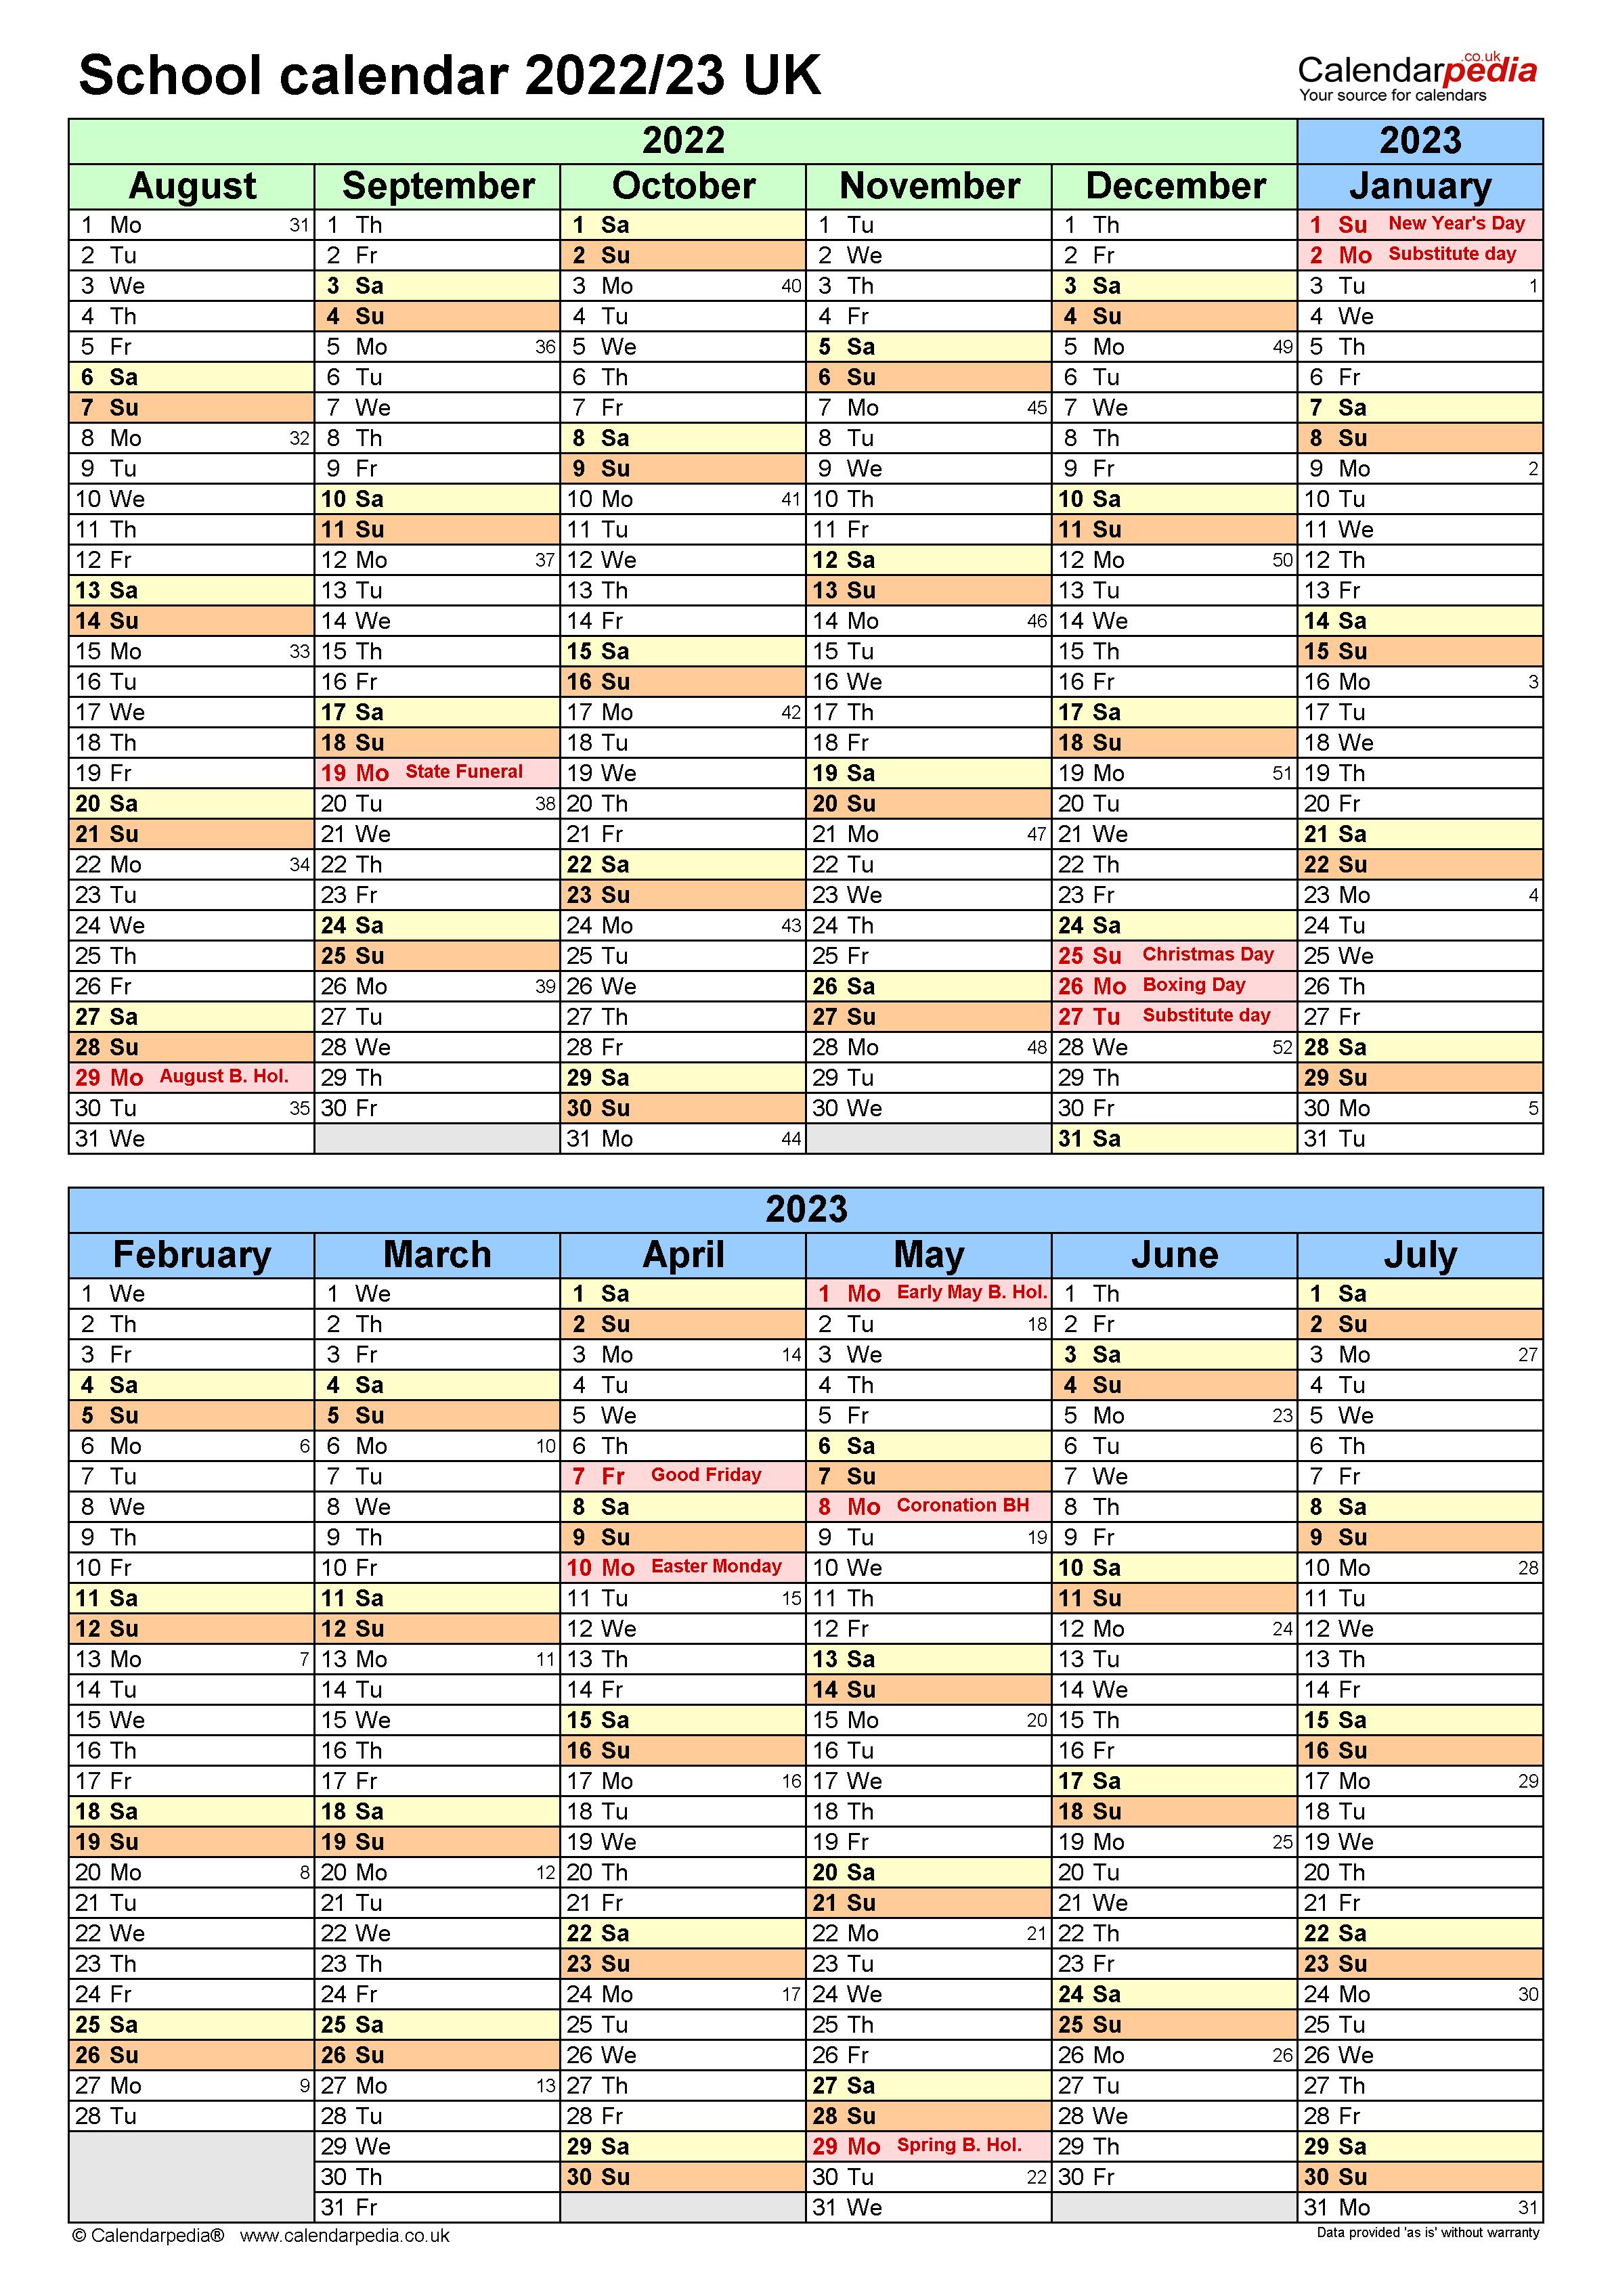 School calendars 2022/2023 as free printable Word templates